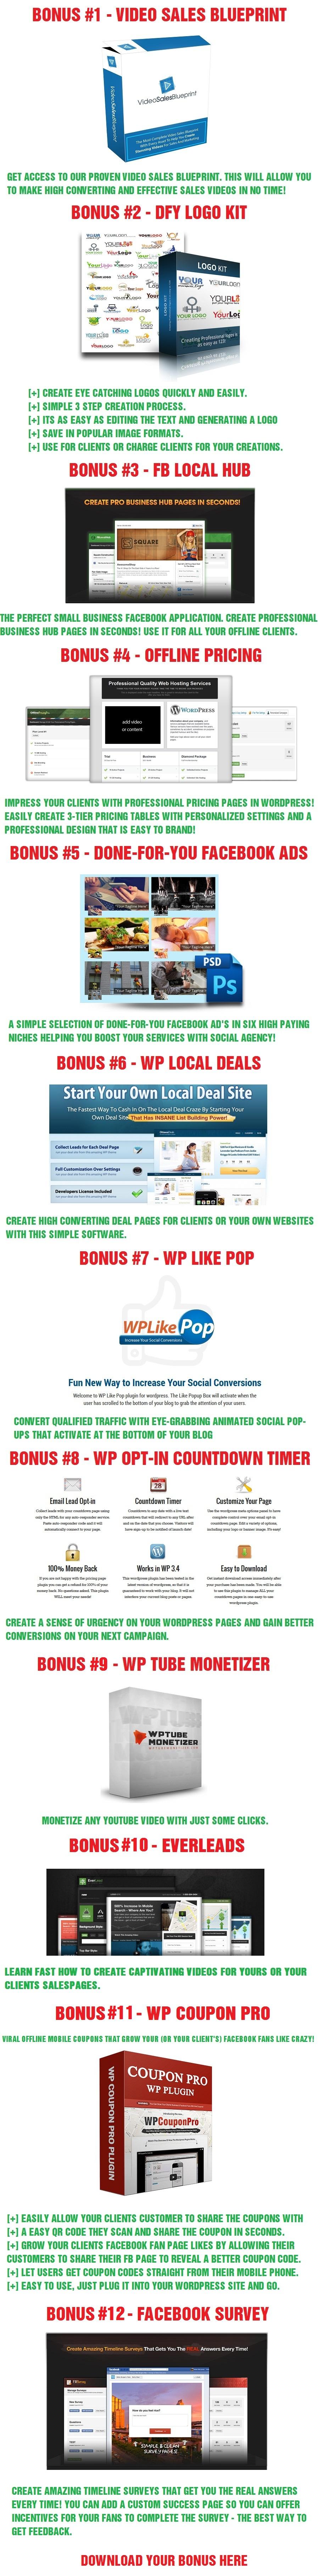 Audience Social Bonuses